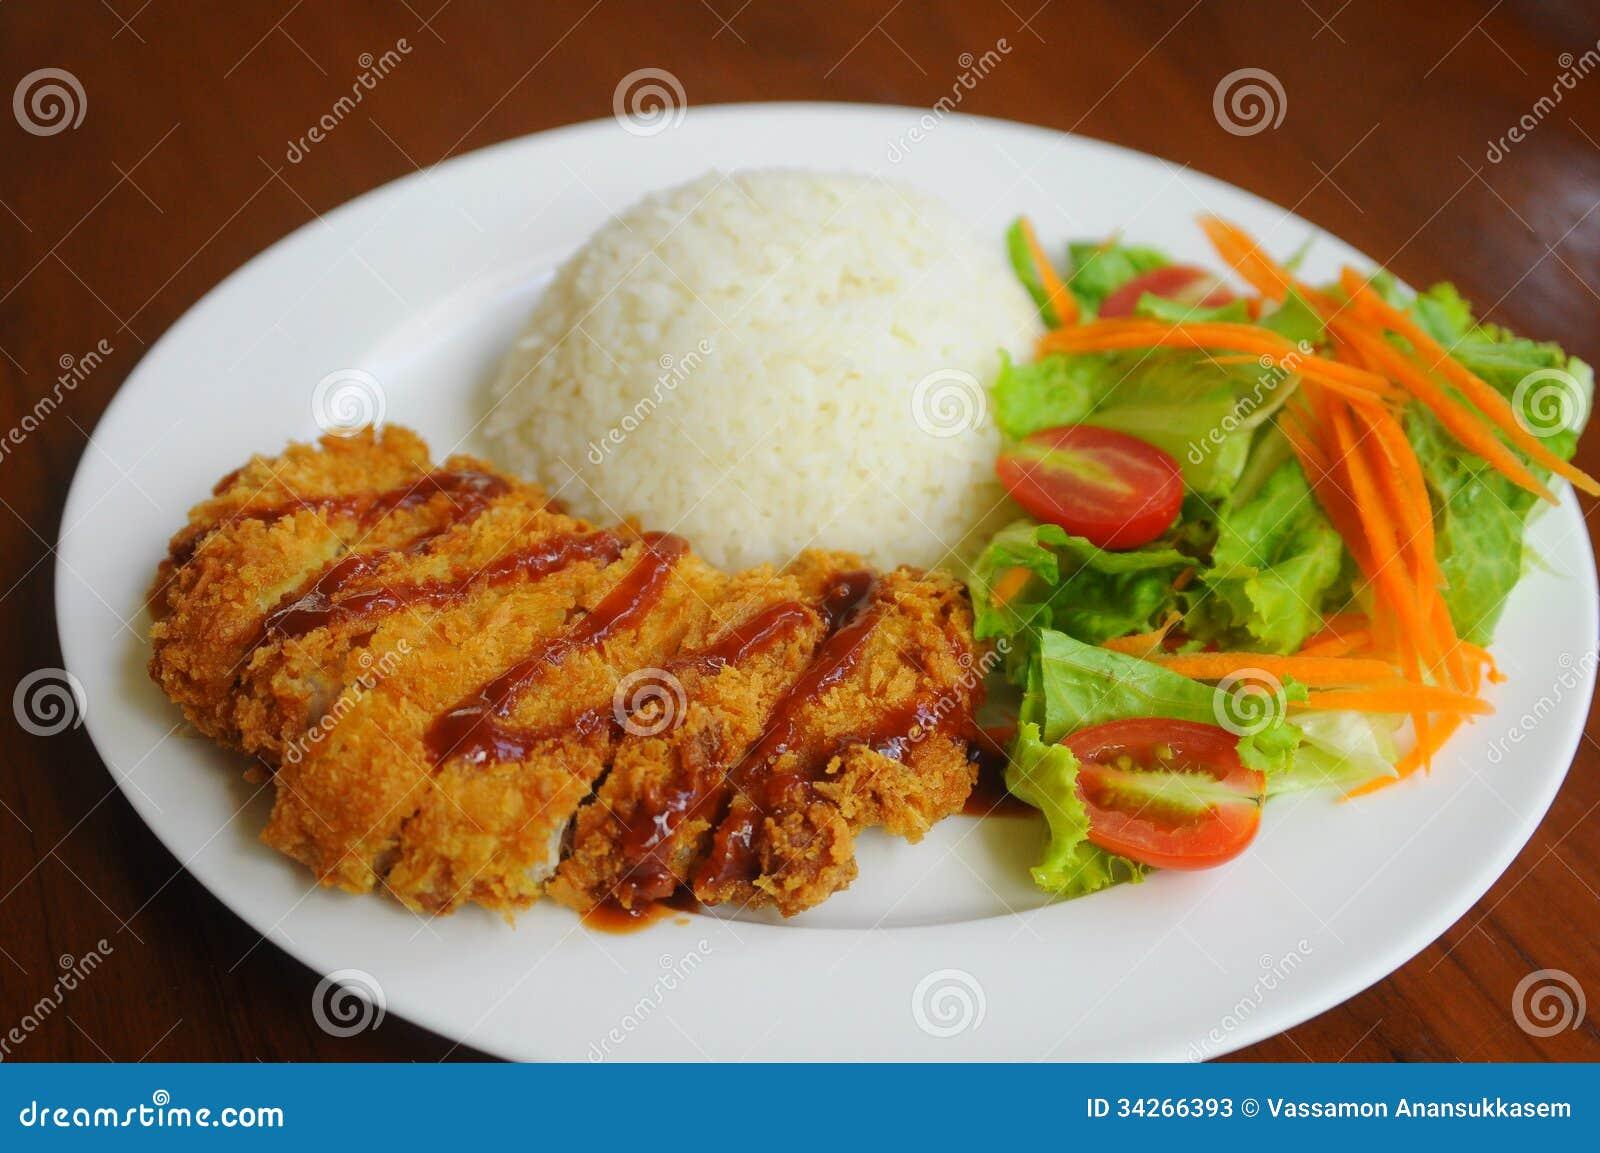 Deep-fried Pork With Rice And Salad Stock Photos - Image ...